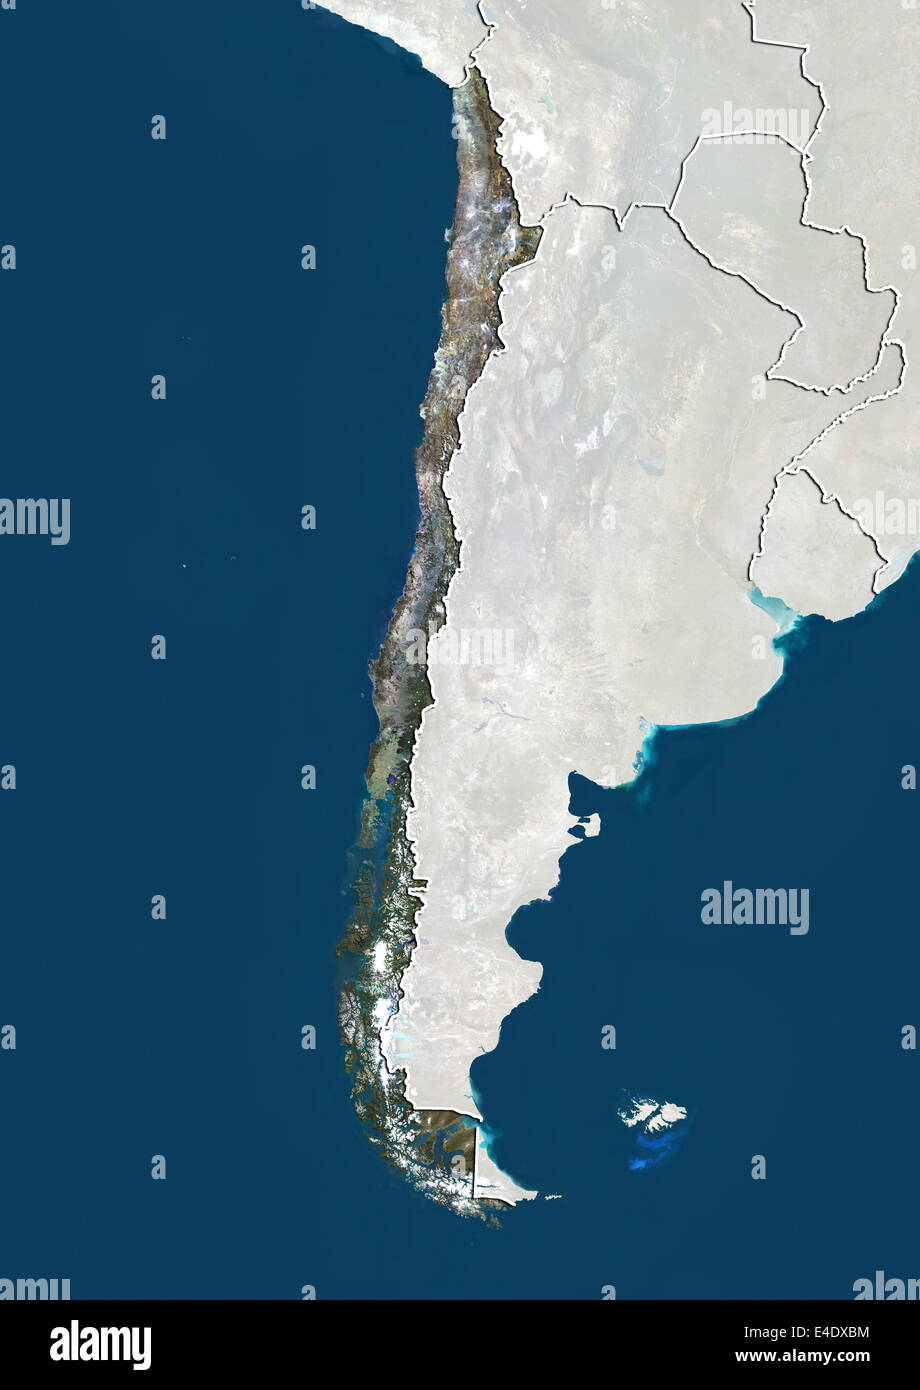 Andes Mountain Range Map Stock Photos & Andes Mountain Range Map ...